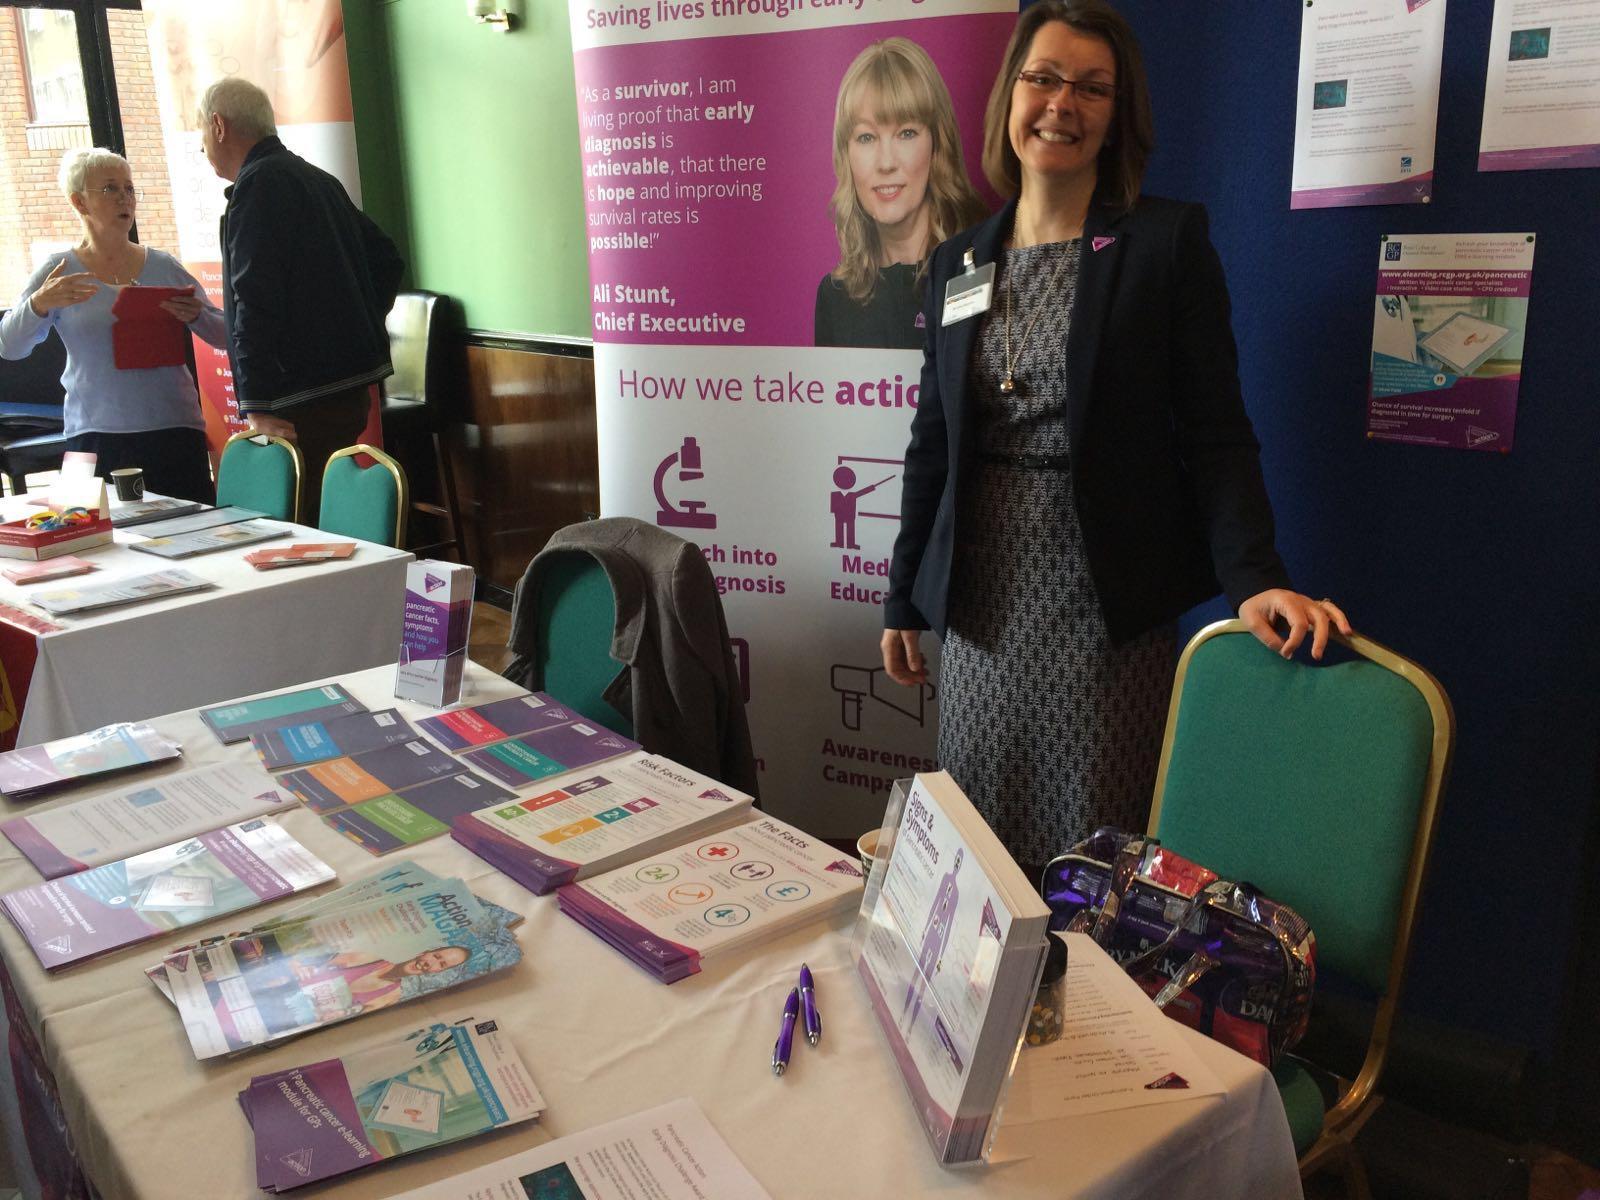 Pancreatic Cancer Action At The London Pancreas Workshop